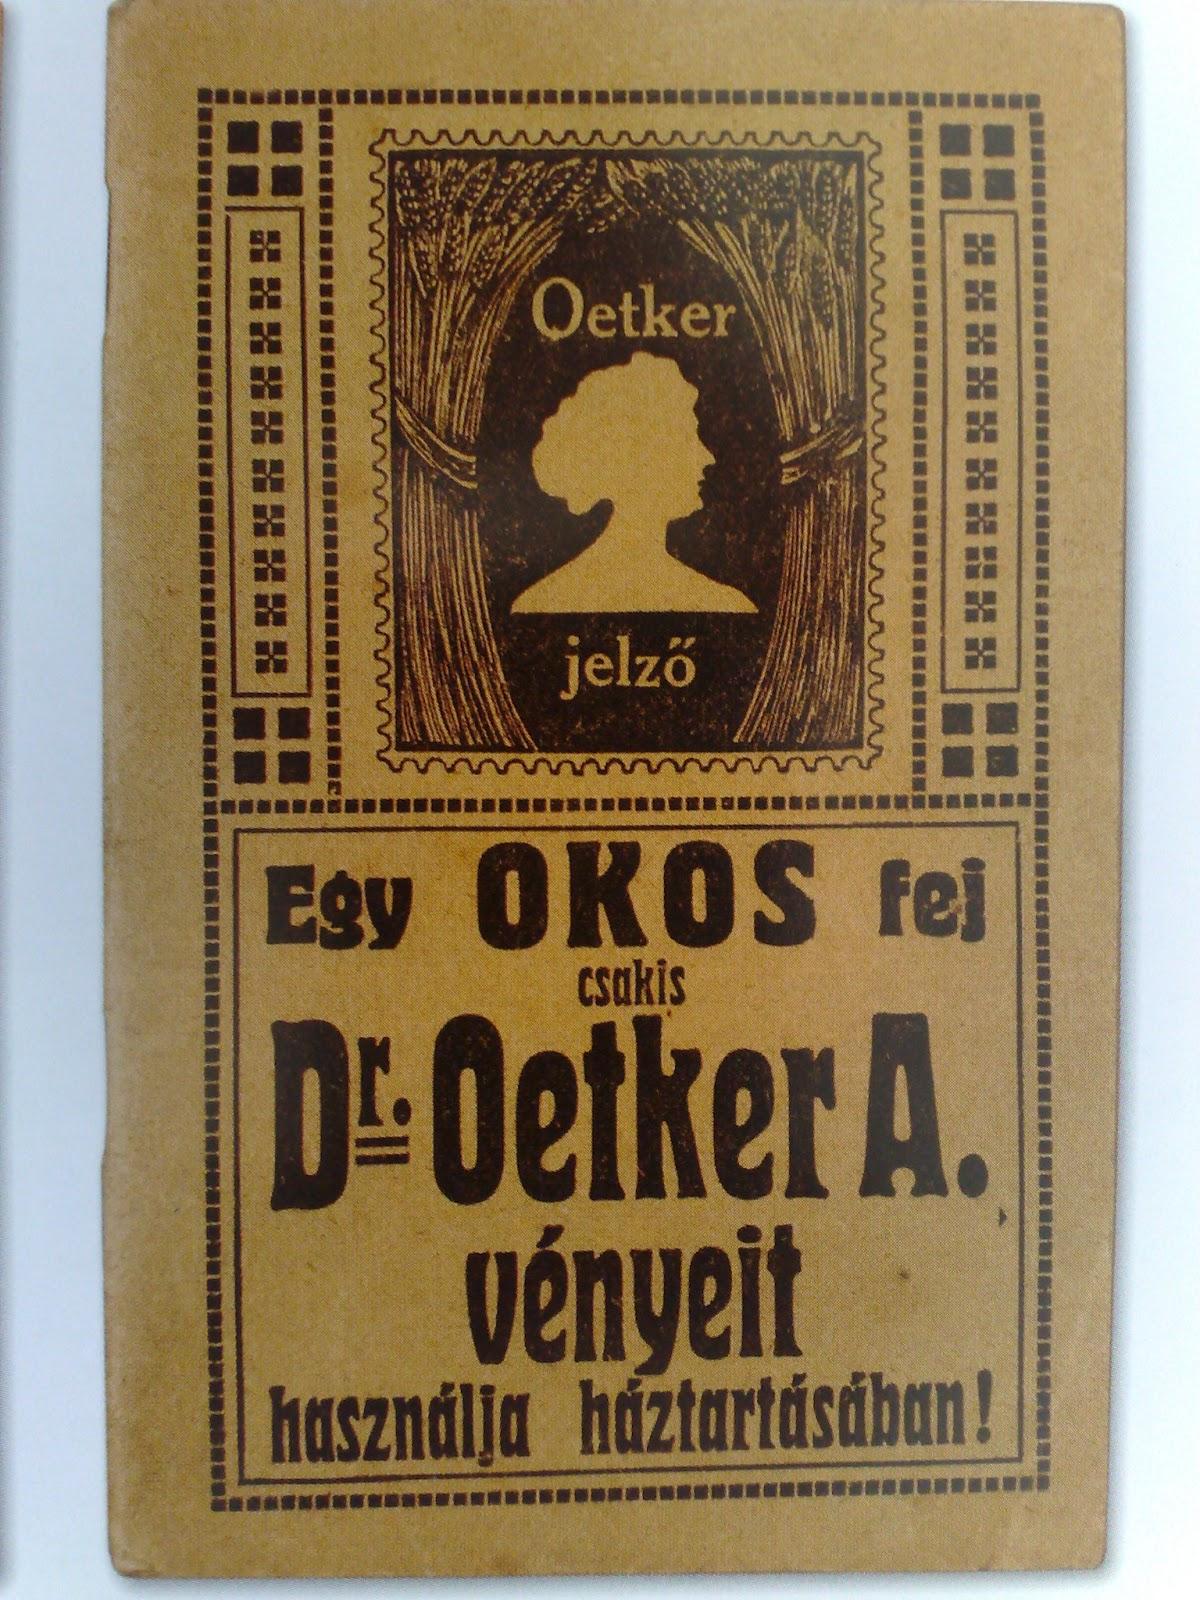 Dr Oetker Az